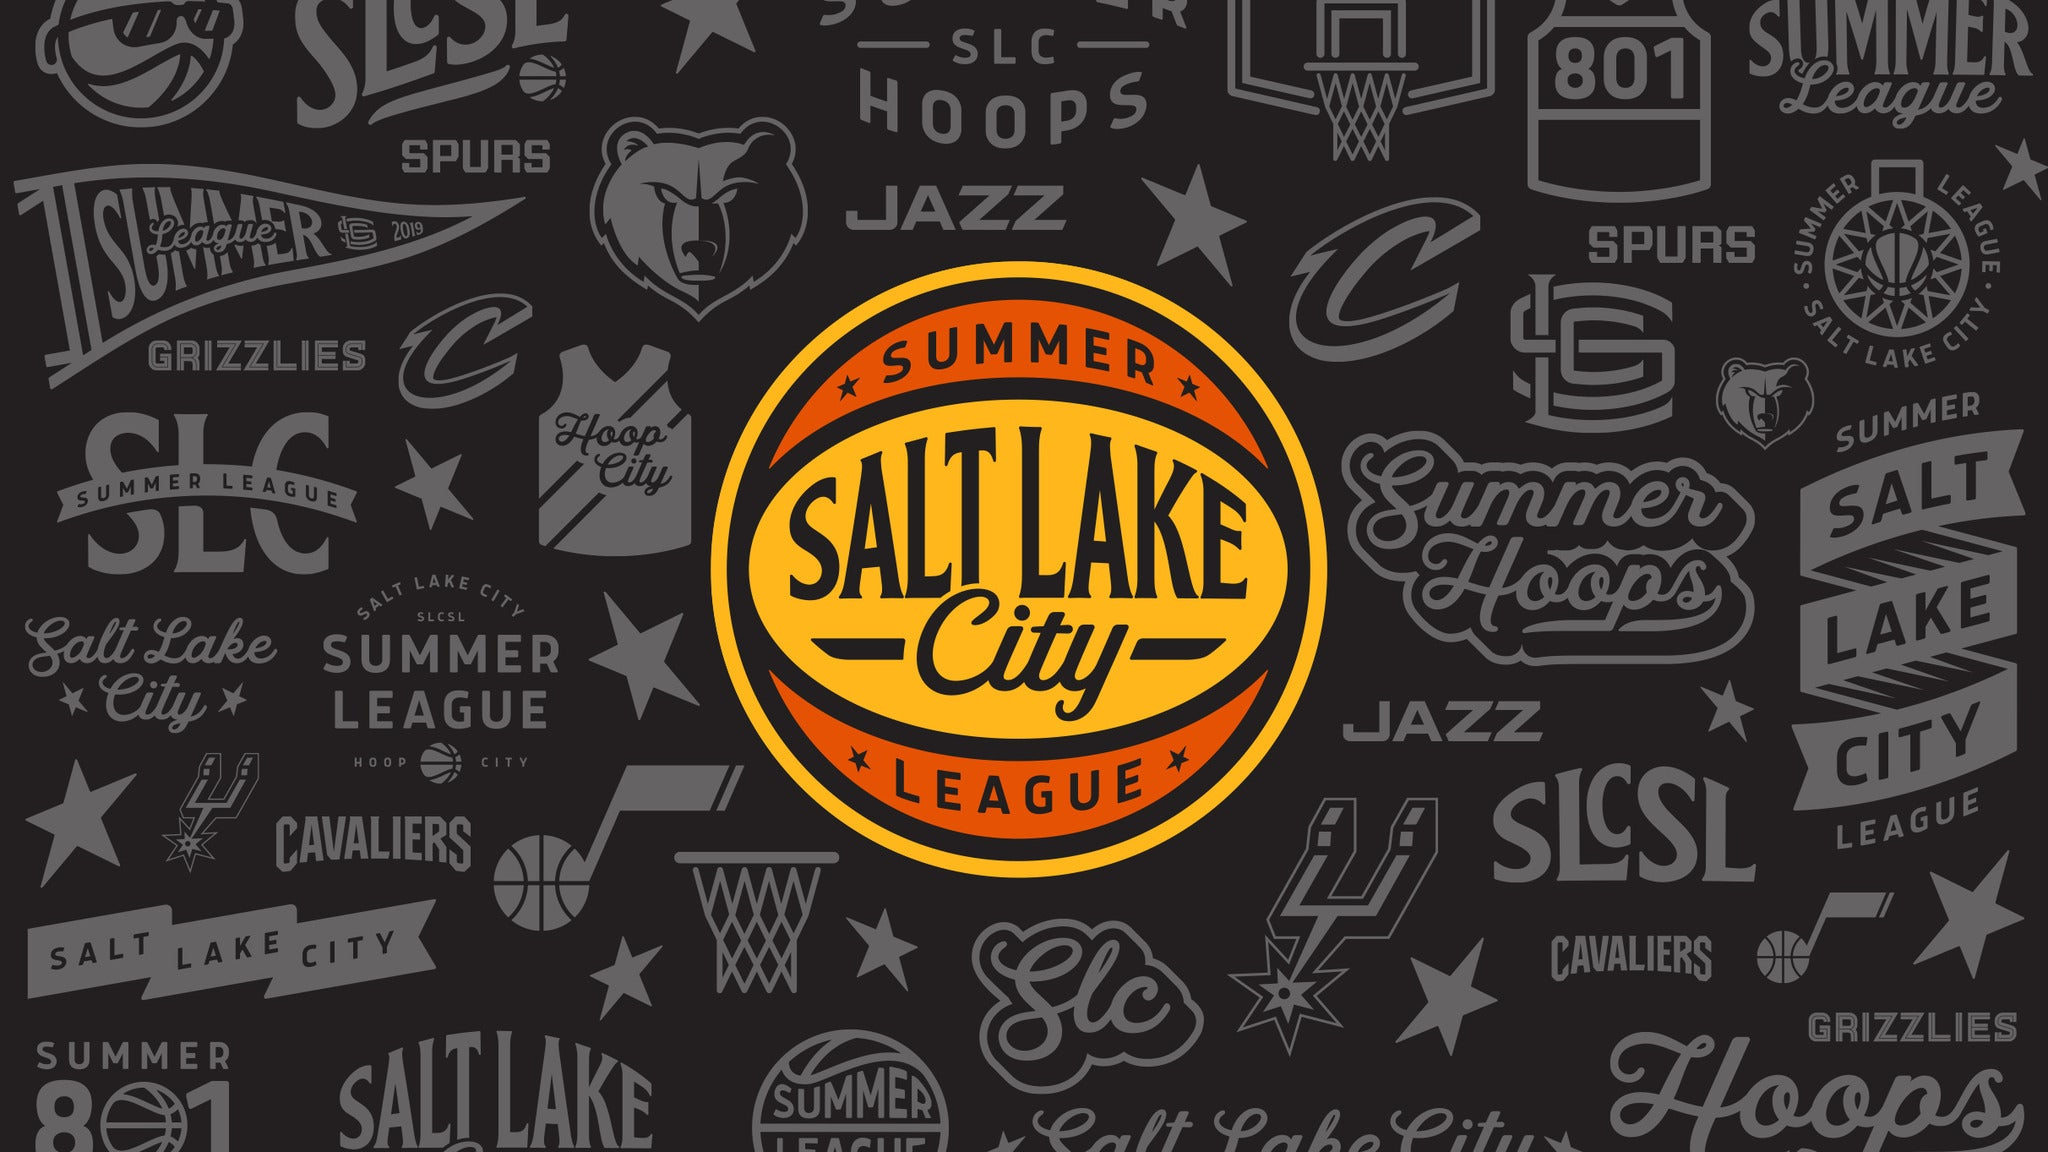 2019 Salt Lake City Summer League at Vivint Smart Home Arena